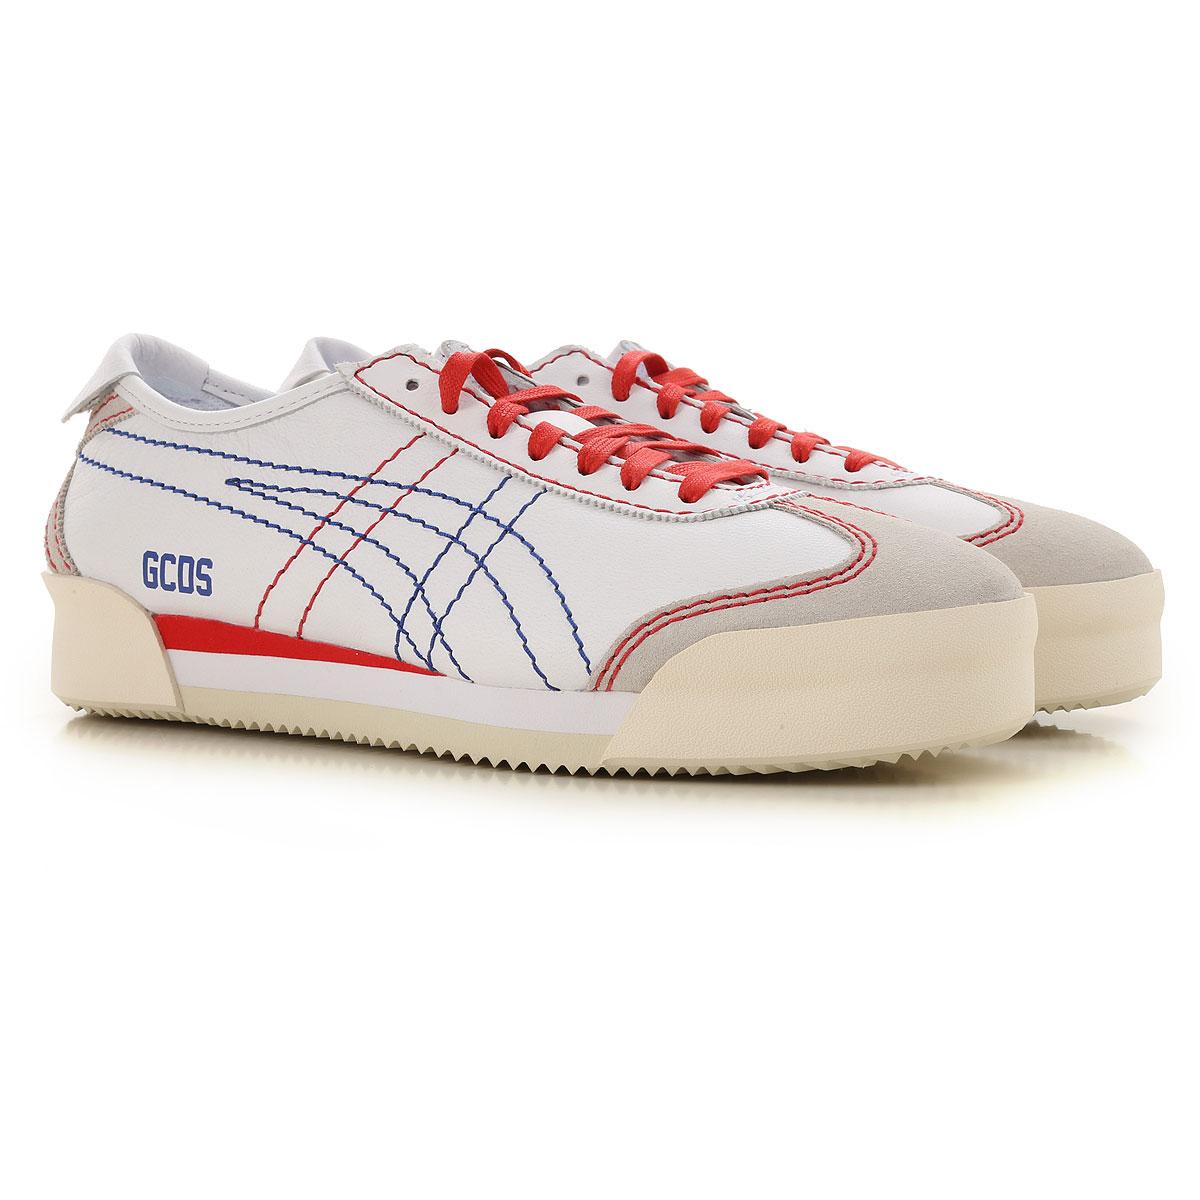 GCDS Sneaker Homme, Onitsuka Tiger, Blanc, Cuir, 2019, 38 40 41 42 43.5 44 45